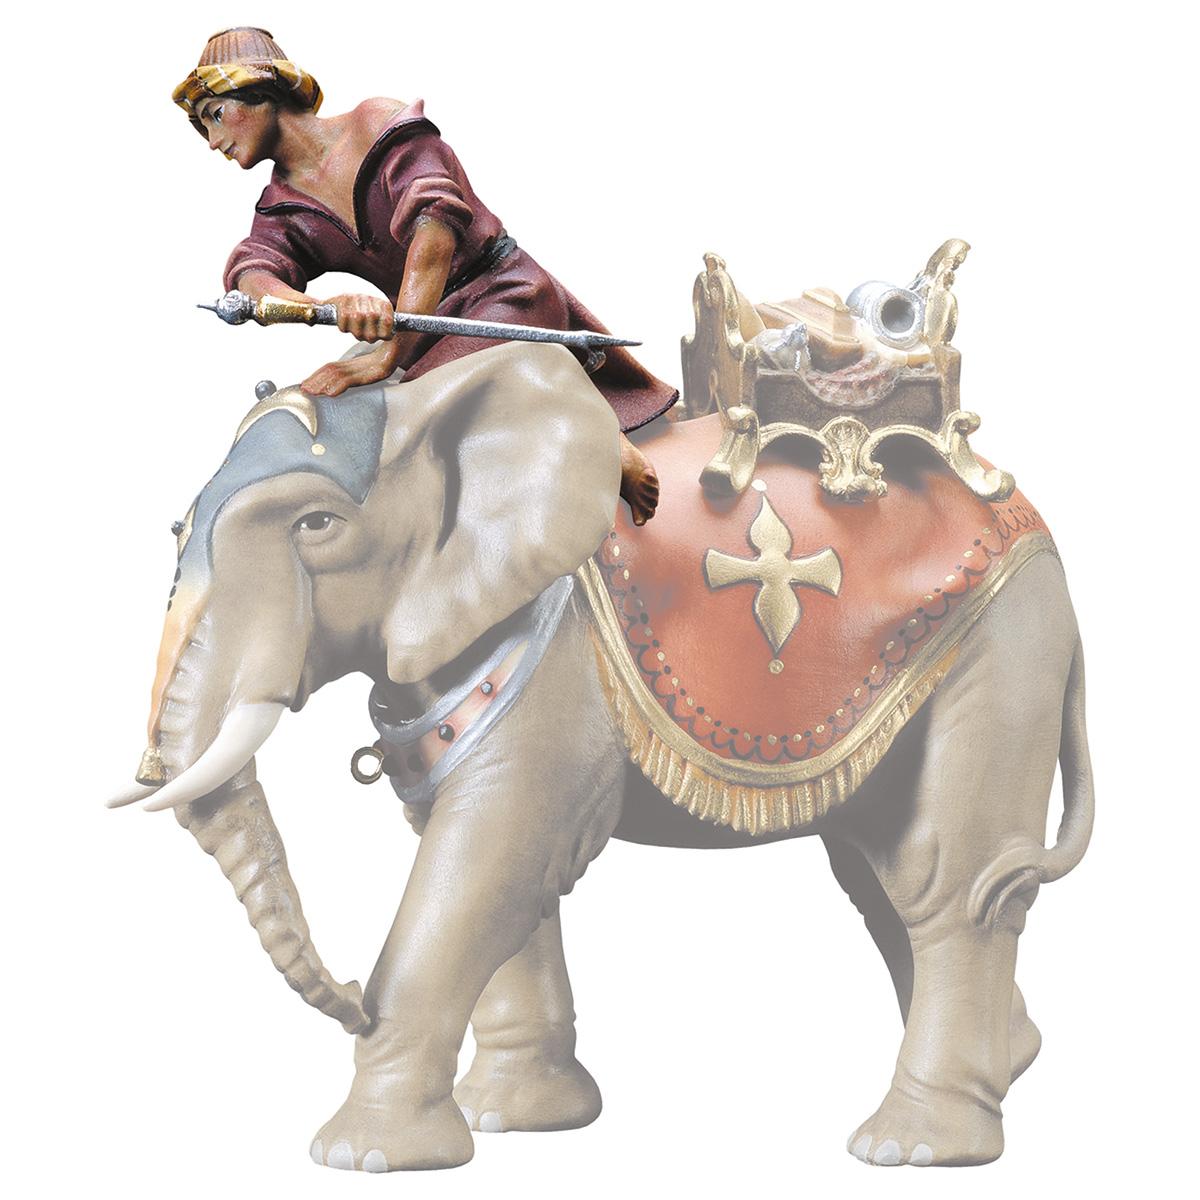 Elefantentreiber sitzend (ohne Elefant)